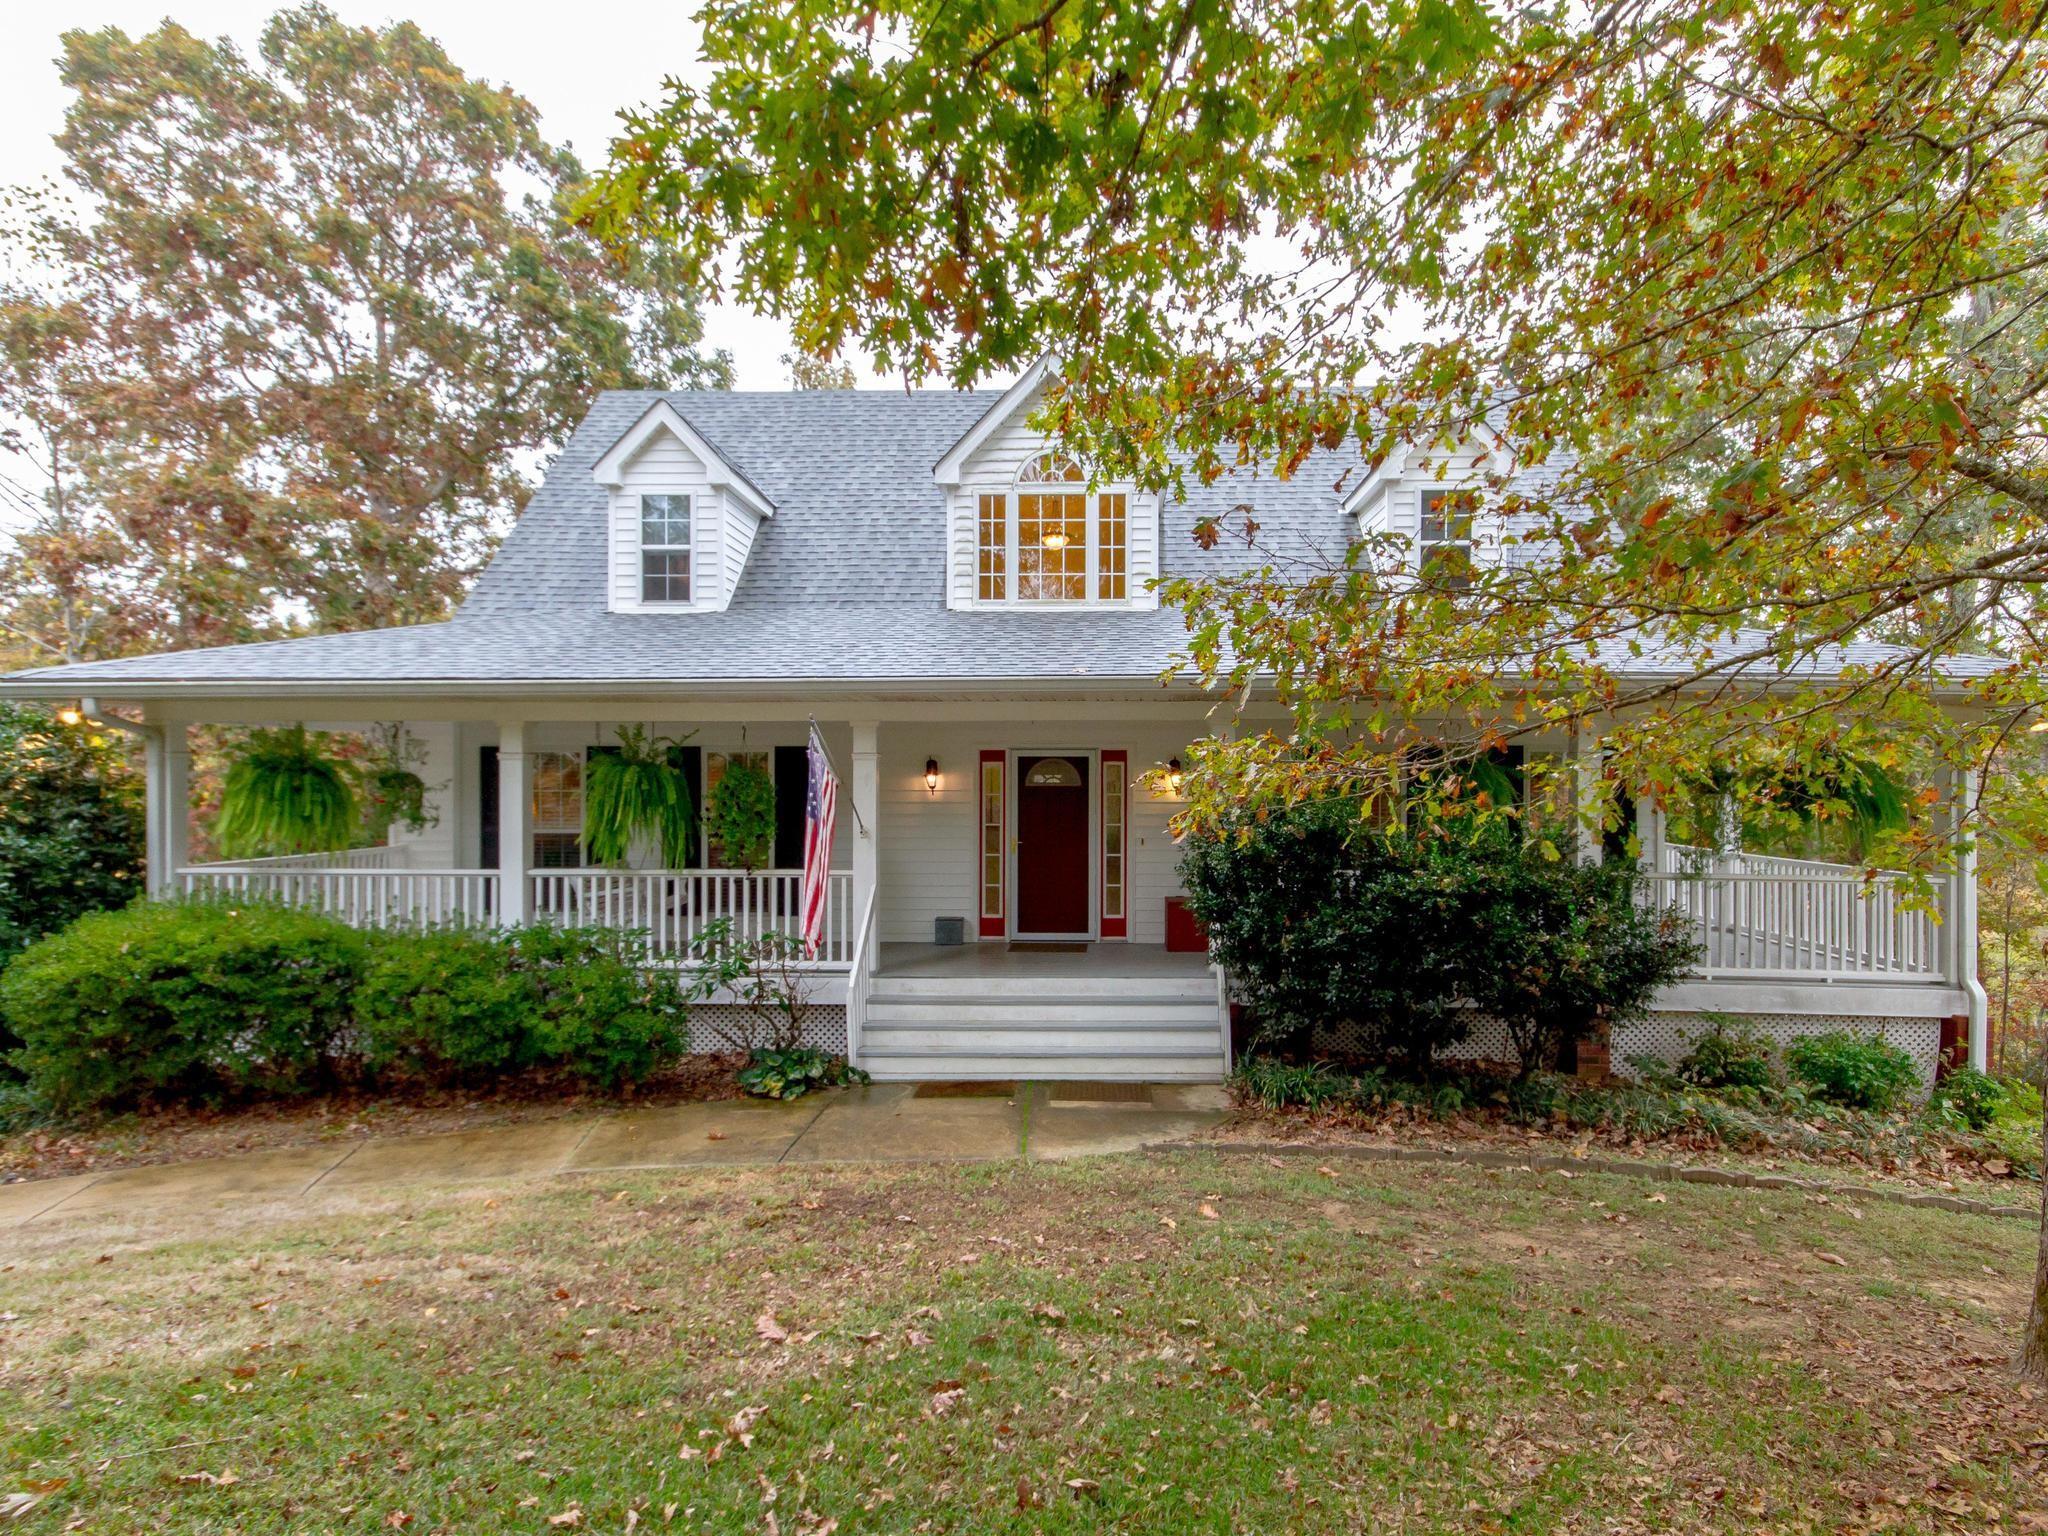 1310 Teri Lynn Ct, Kingston Springs, TN 37082 - Kingston Springs, TN real estate listing